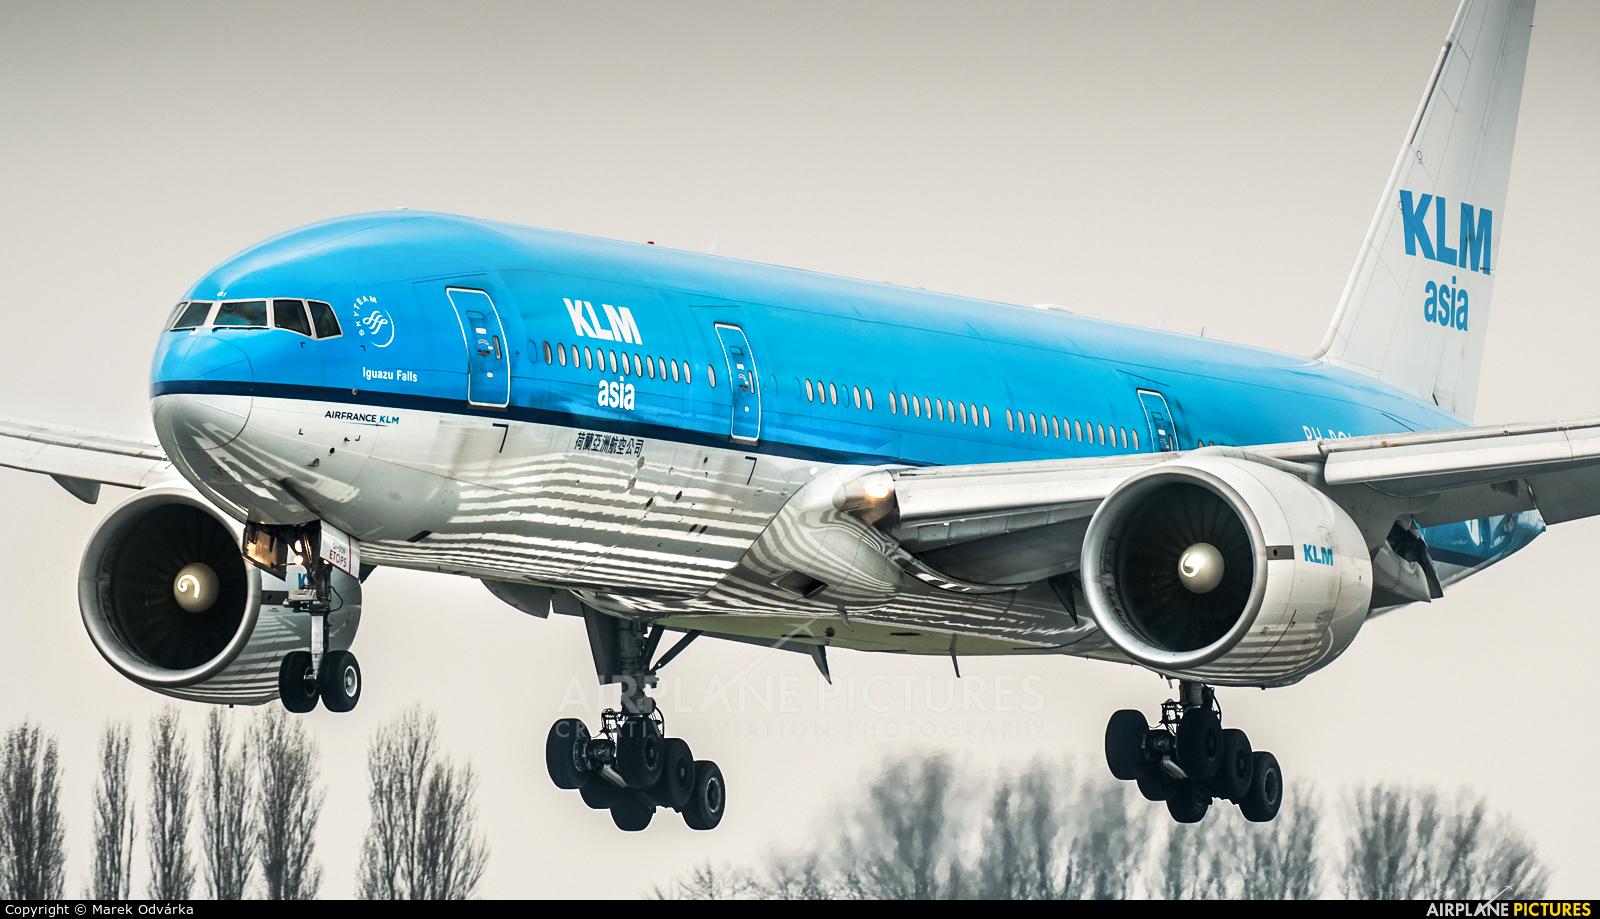 KLM Asia PH-BQI aircraft at Amsterdam - Schiphol